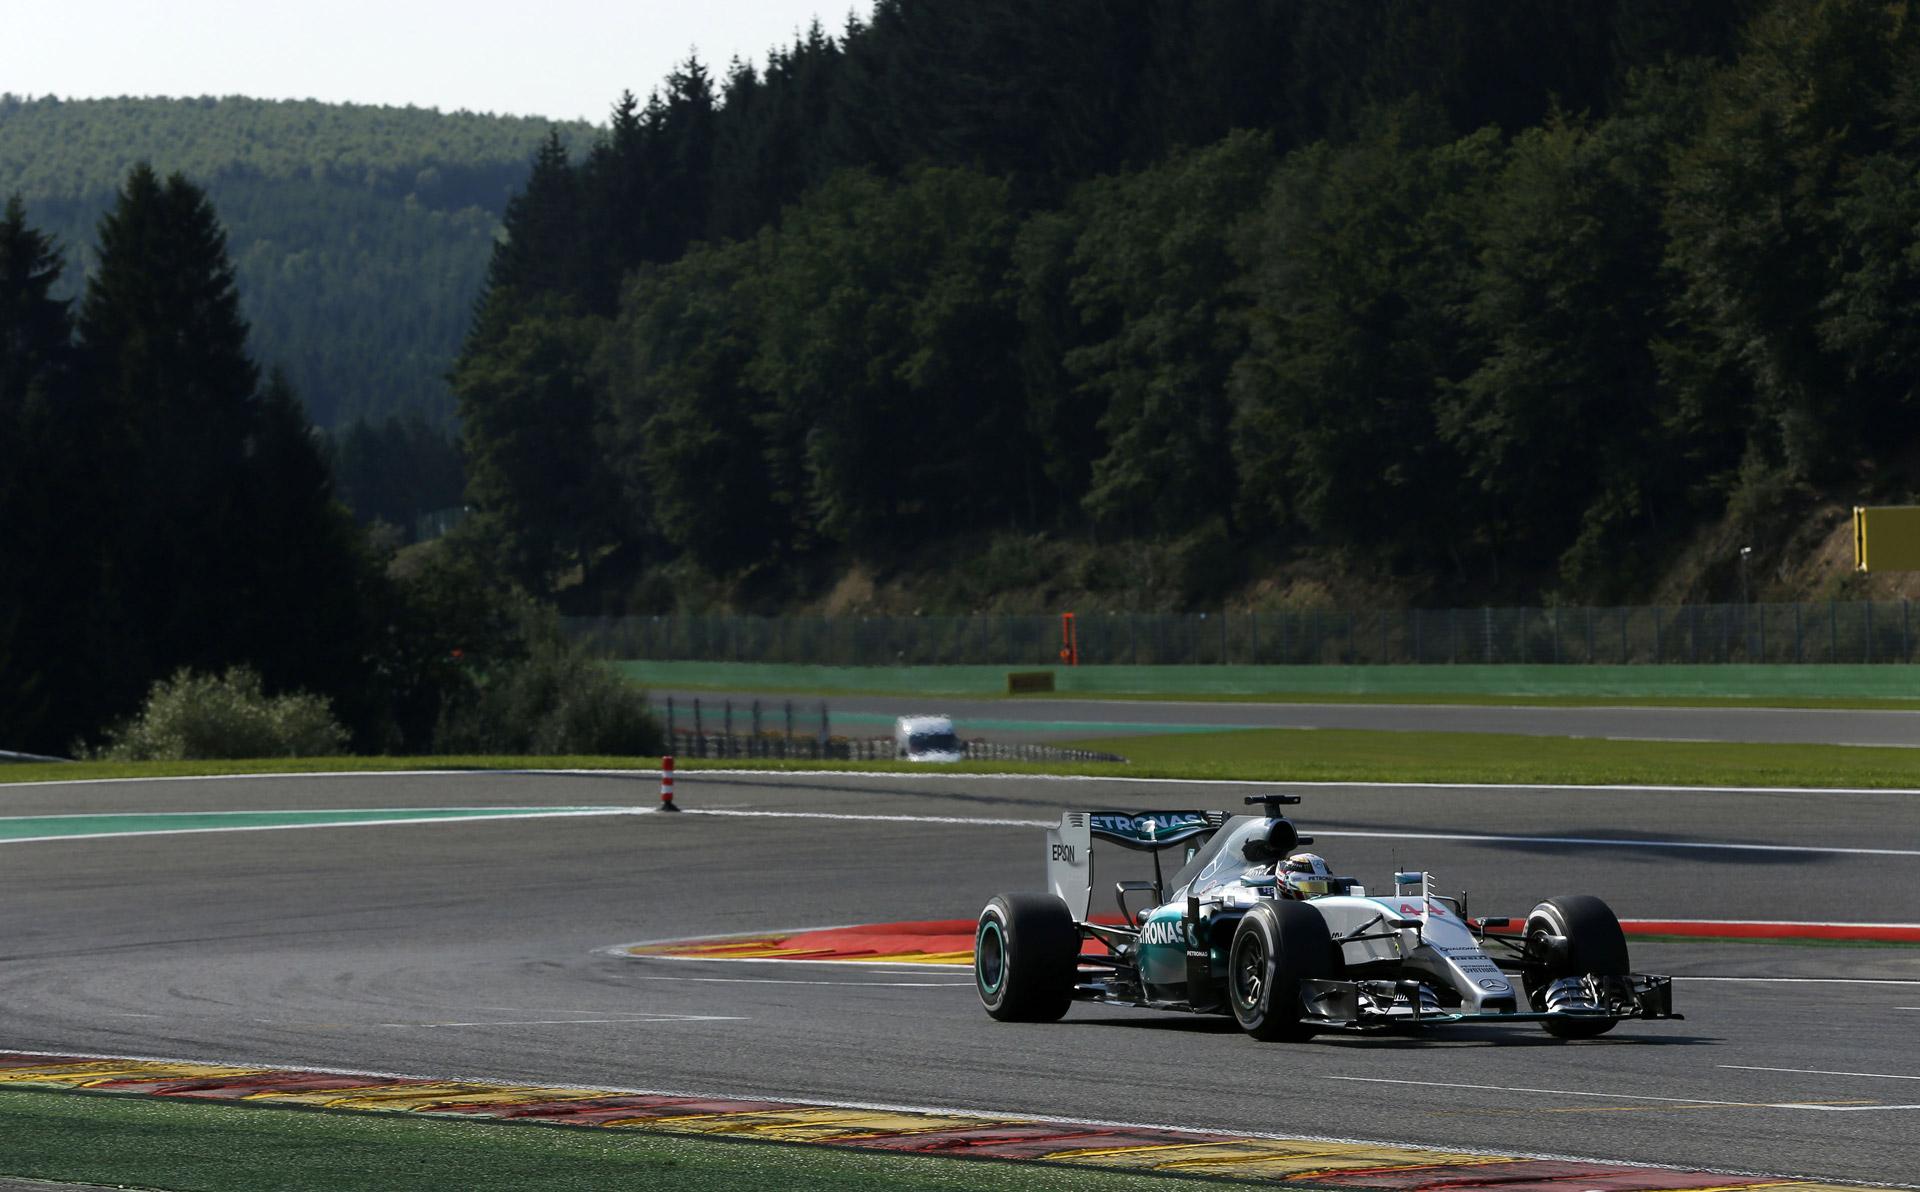 Mercedes AMG Wins 2015 Formula One Belgian Grand Prix, Lotus Makes Podium